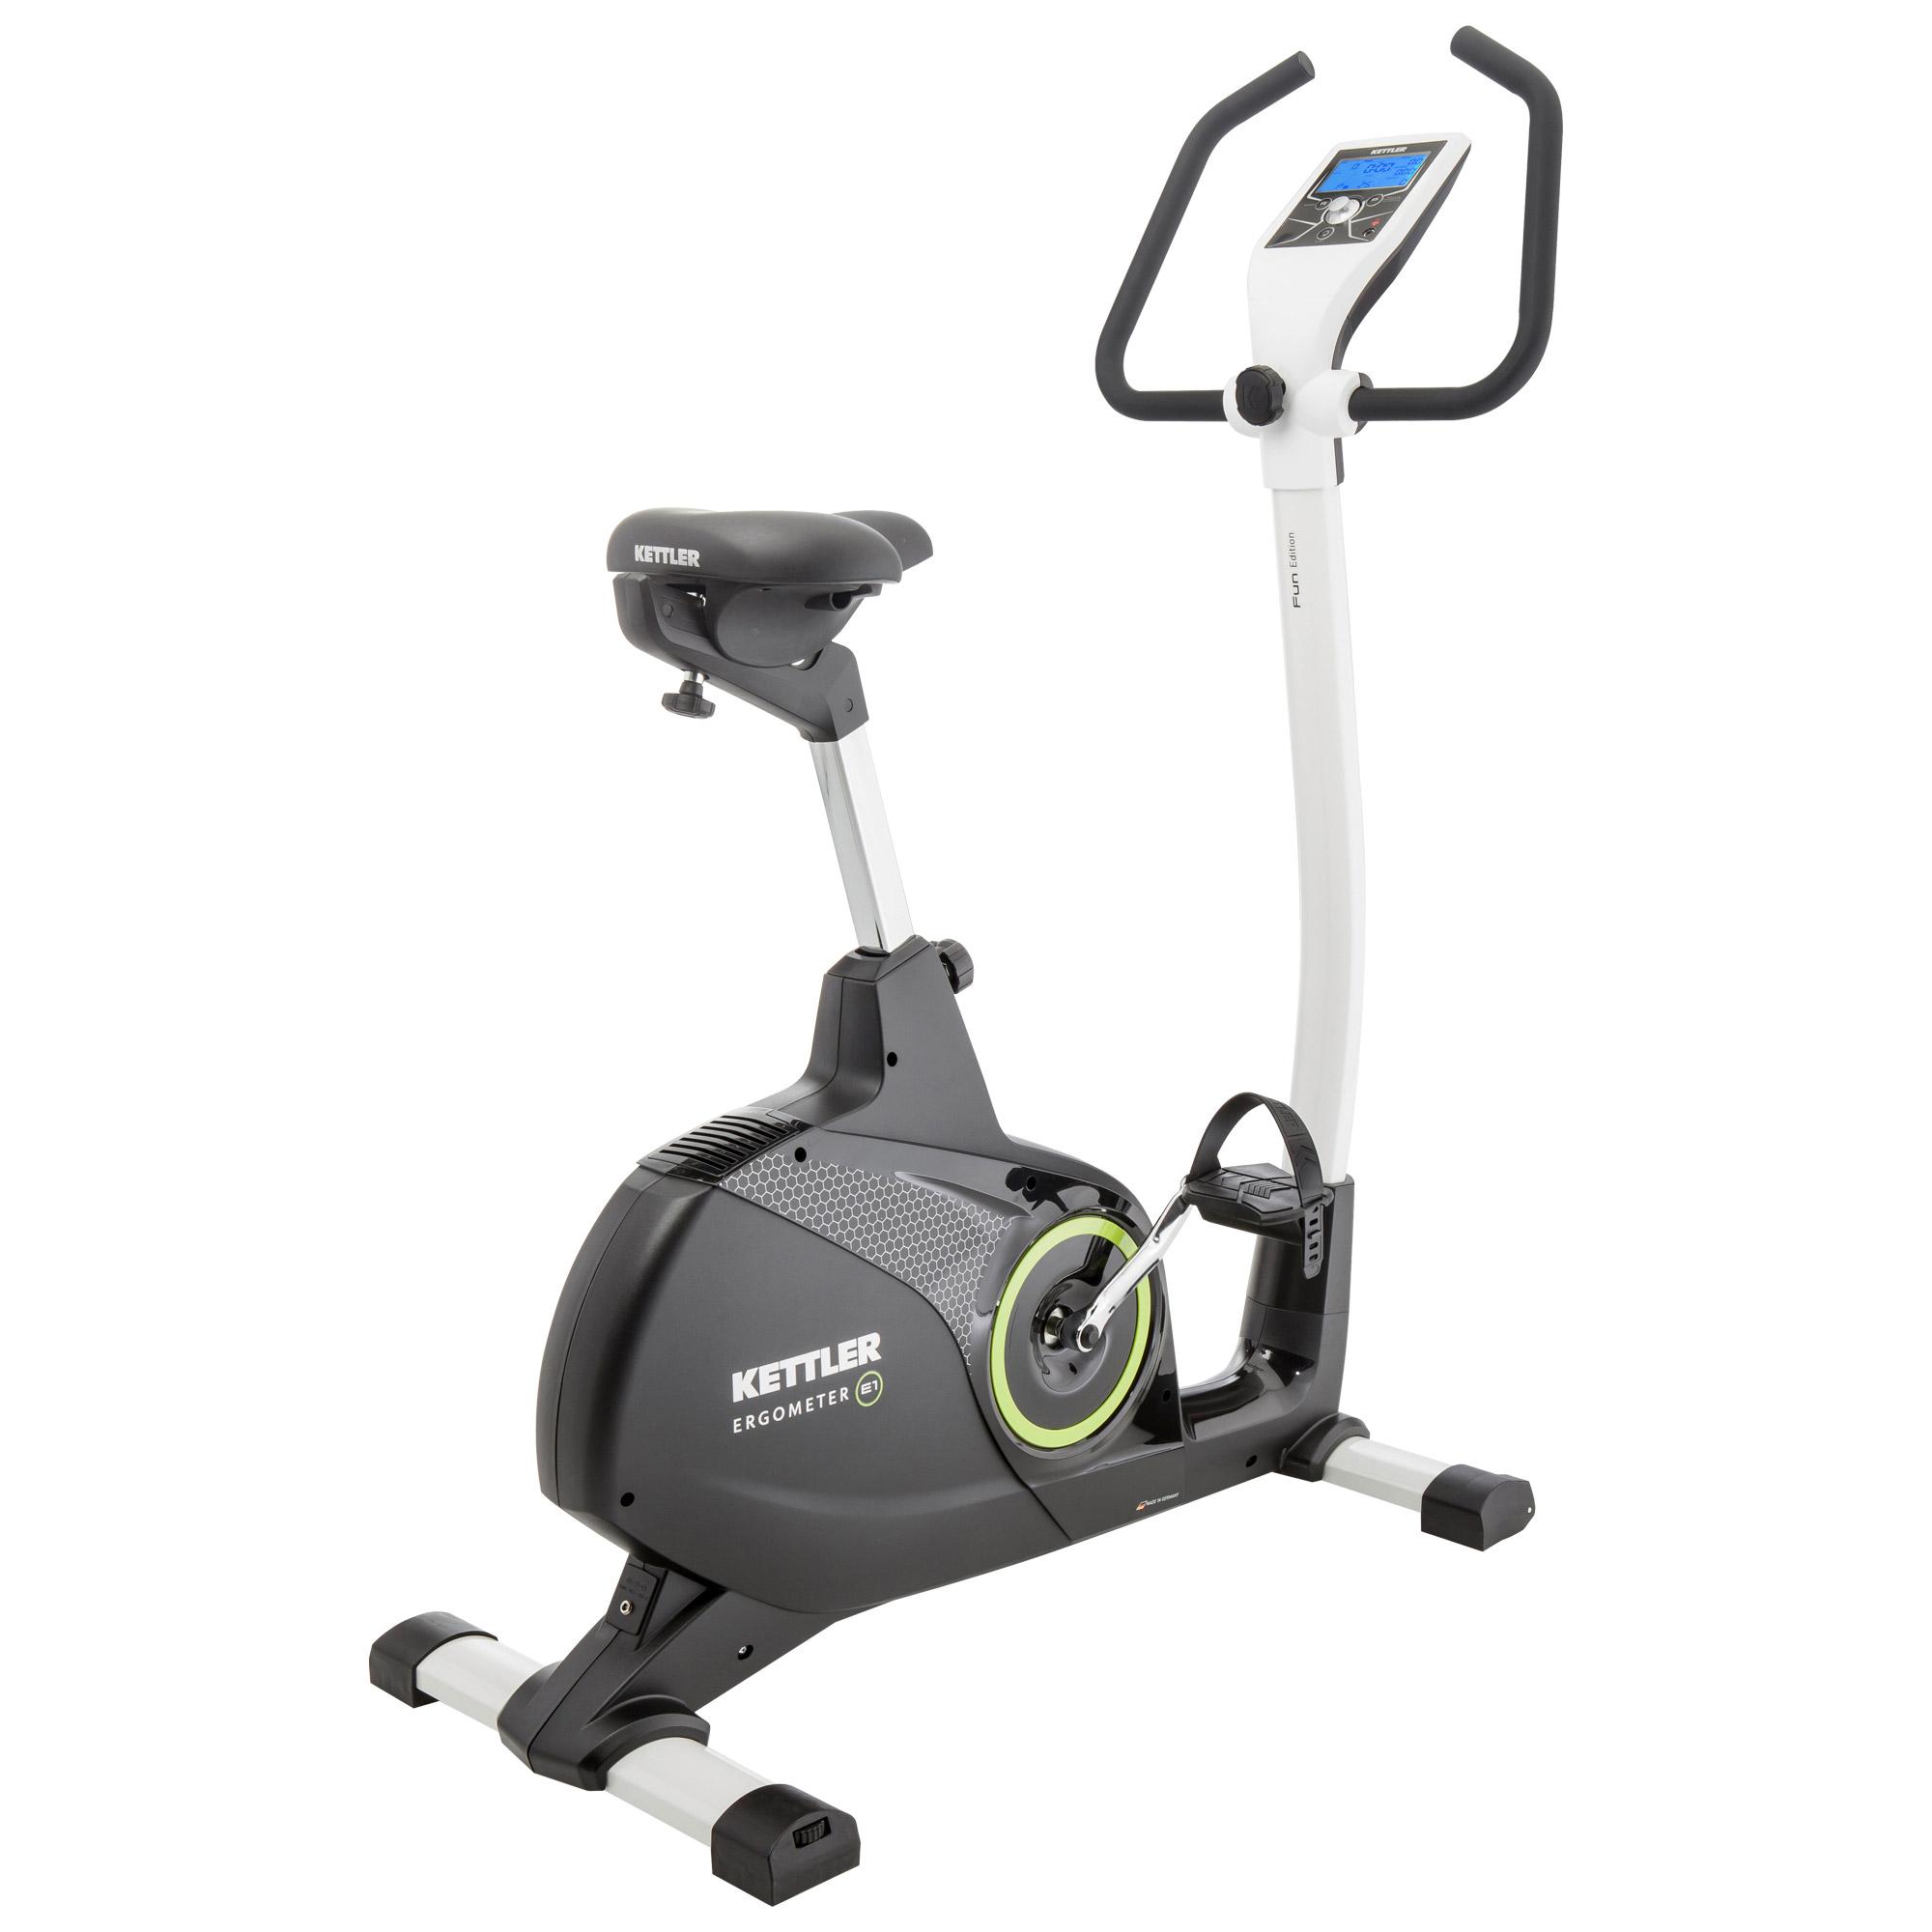 Kettler E1 Fun ergometer hometrainer